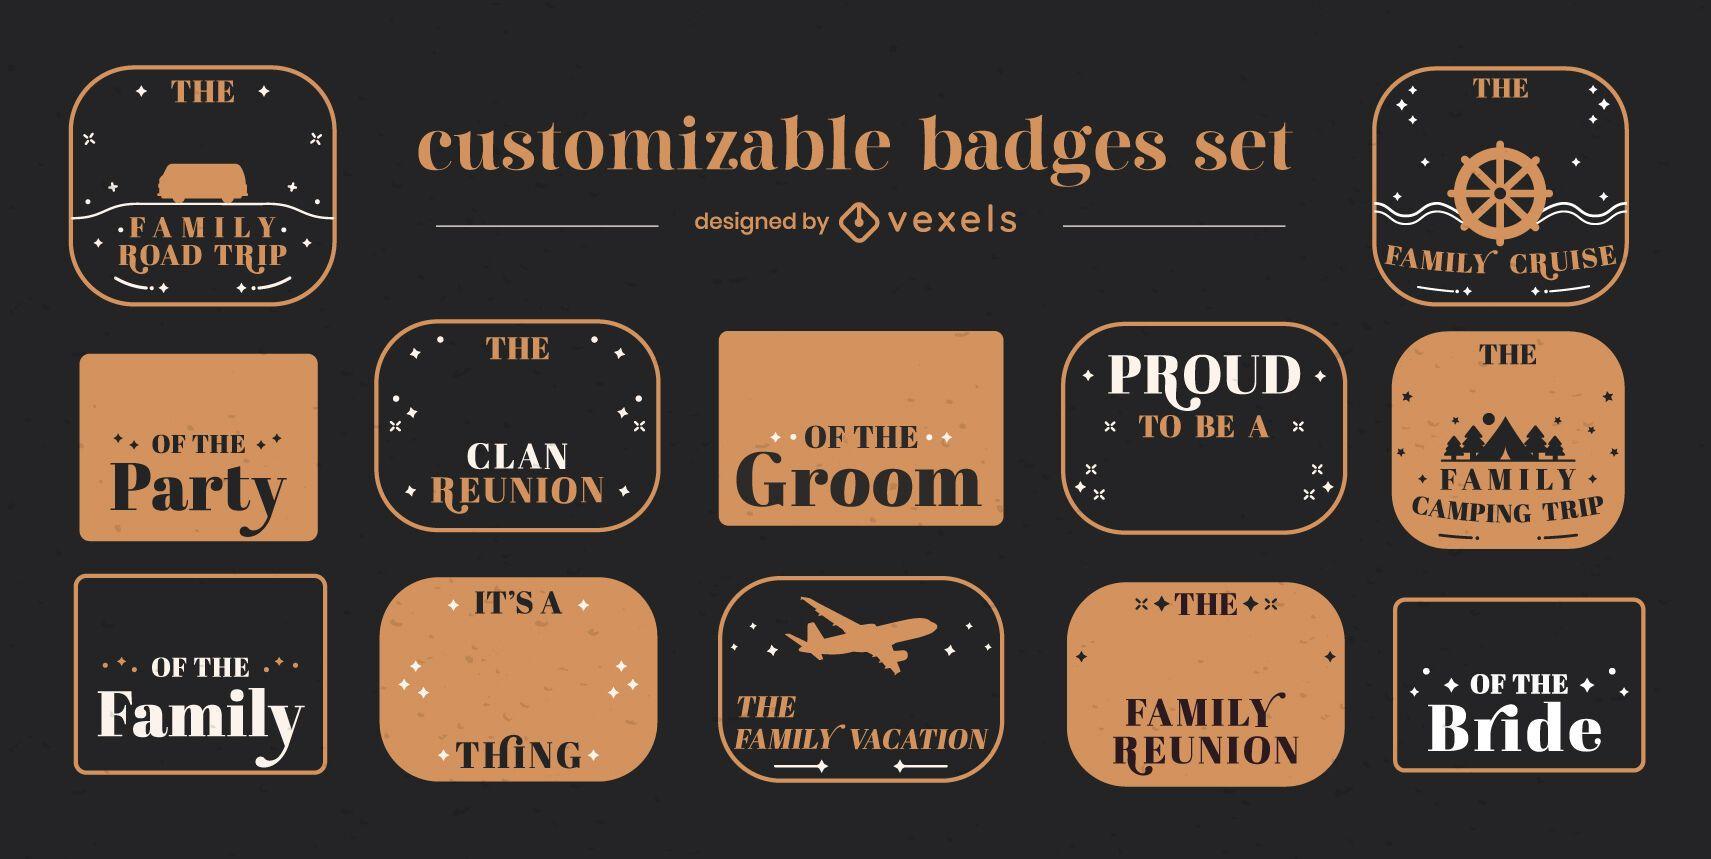 Conjunto personalizable de insignias de viaje familiar